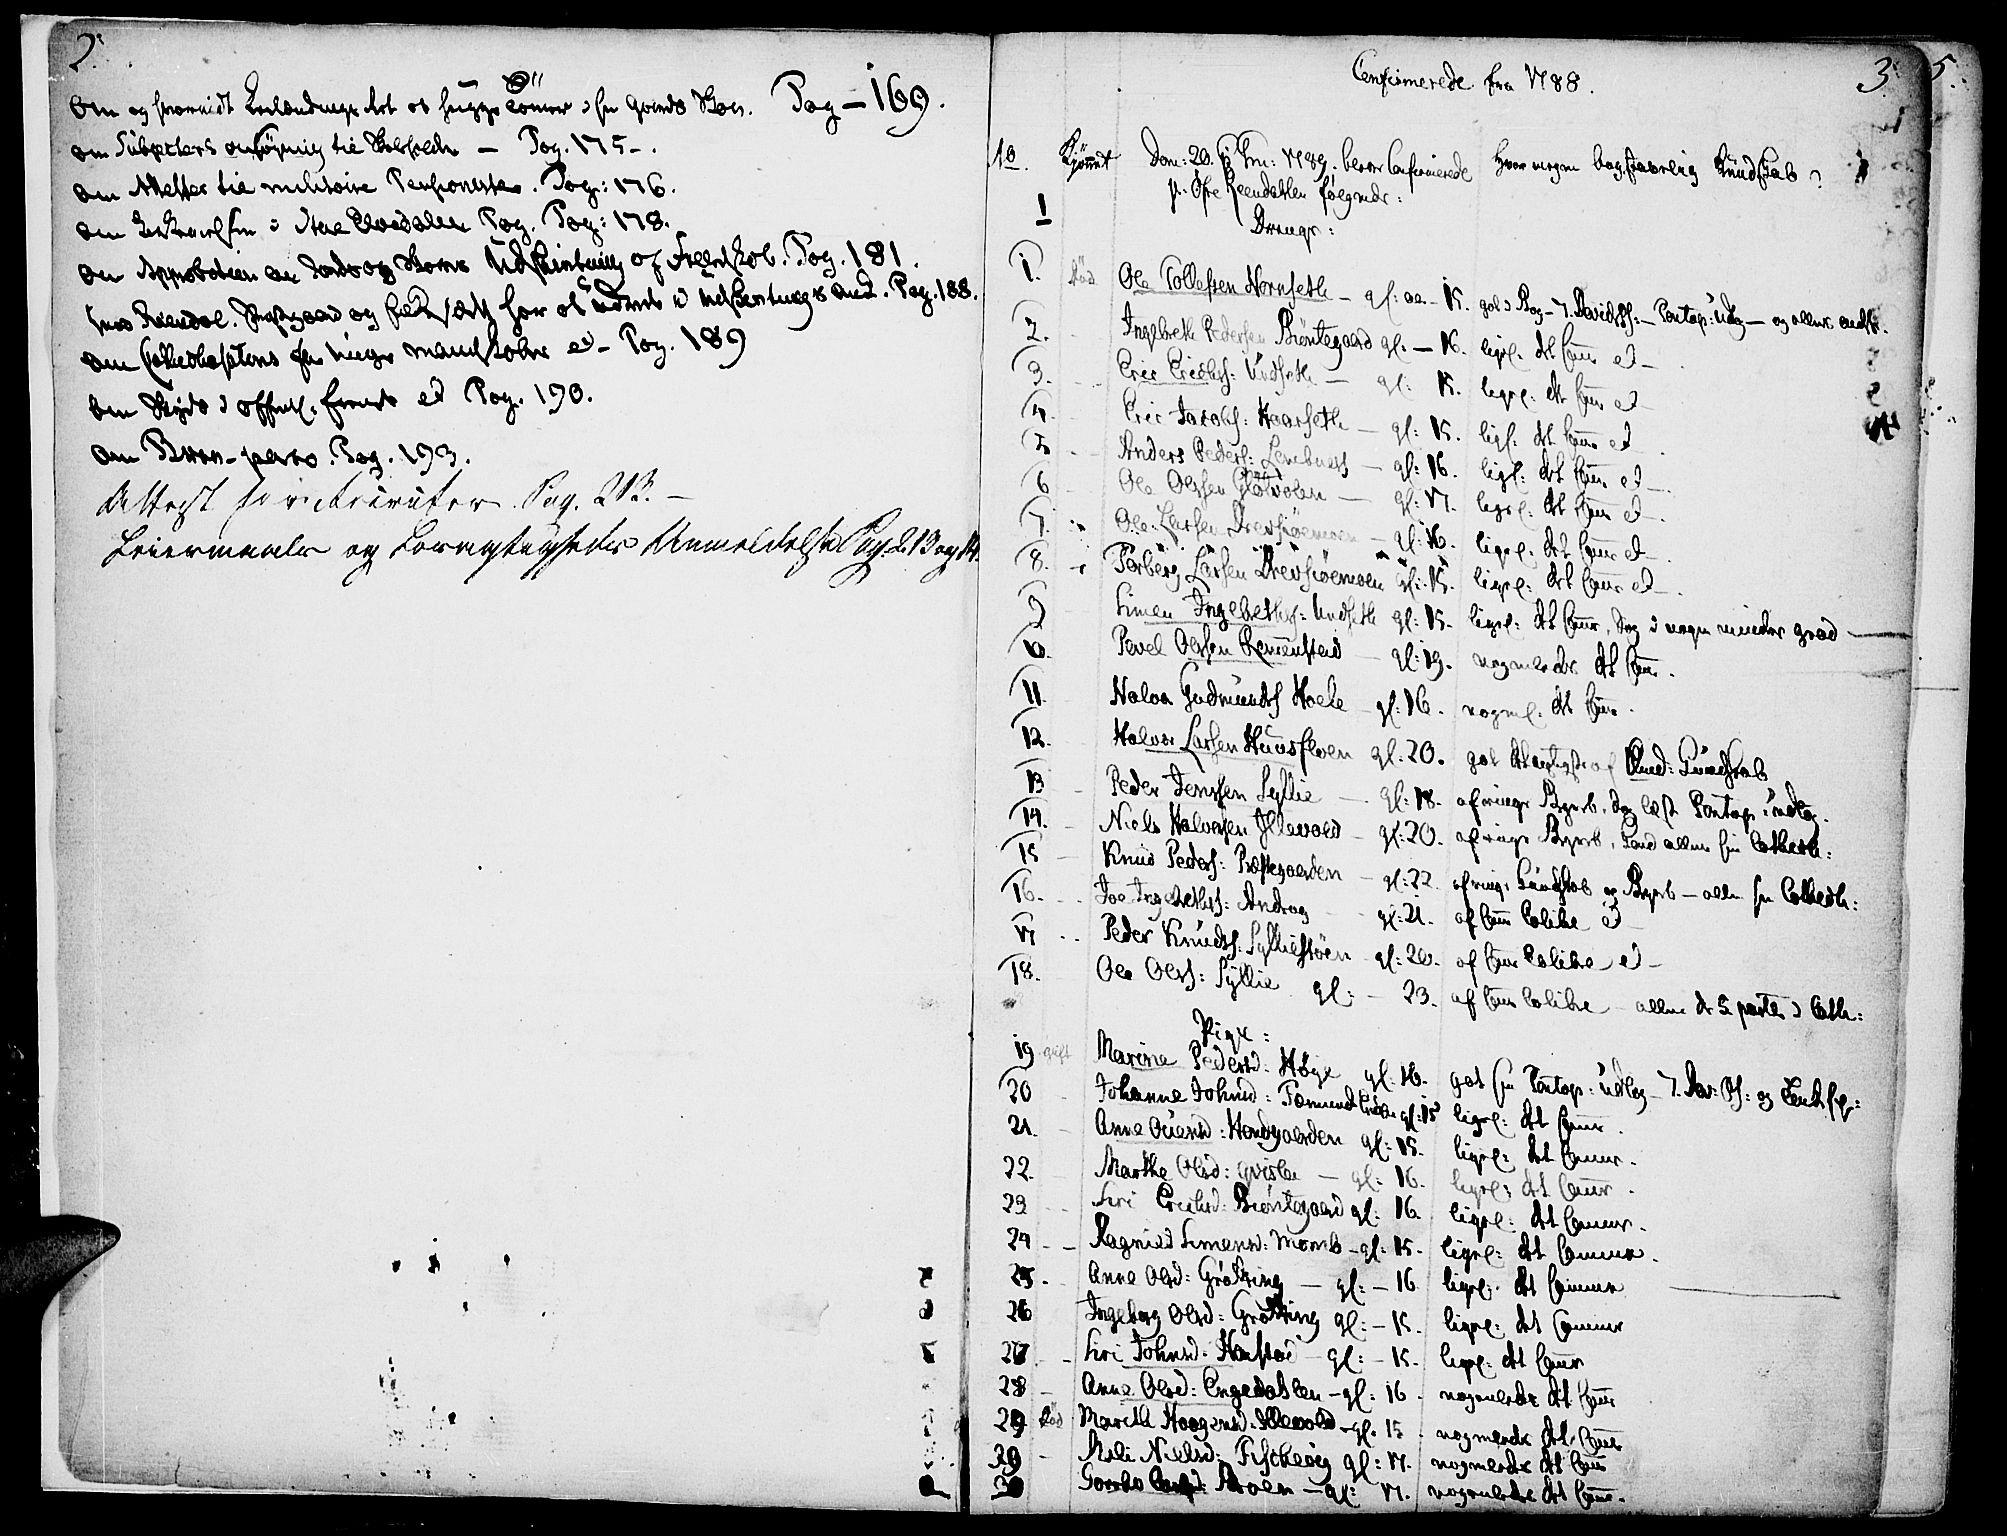 SAH, Rendalen prestekontor, H/Ha/Haa/L0002: Ministerialbok nr. 2, 1788-1814, s. 2-3